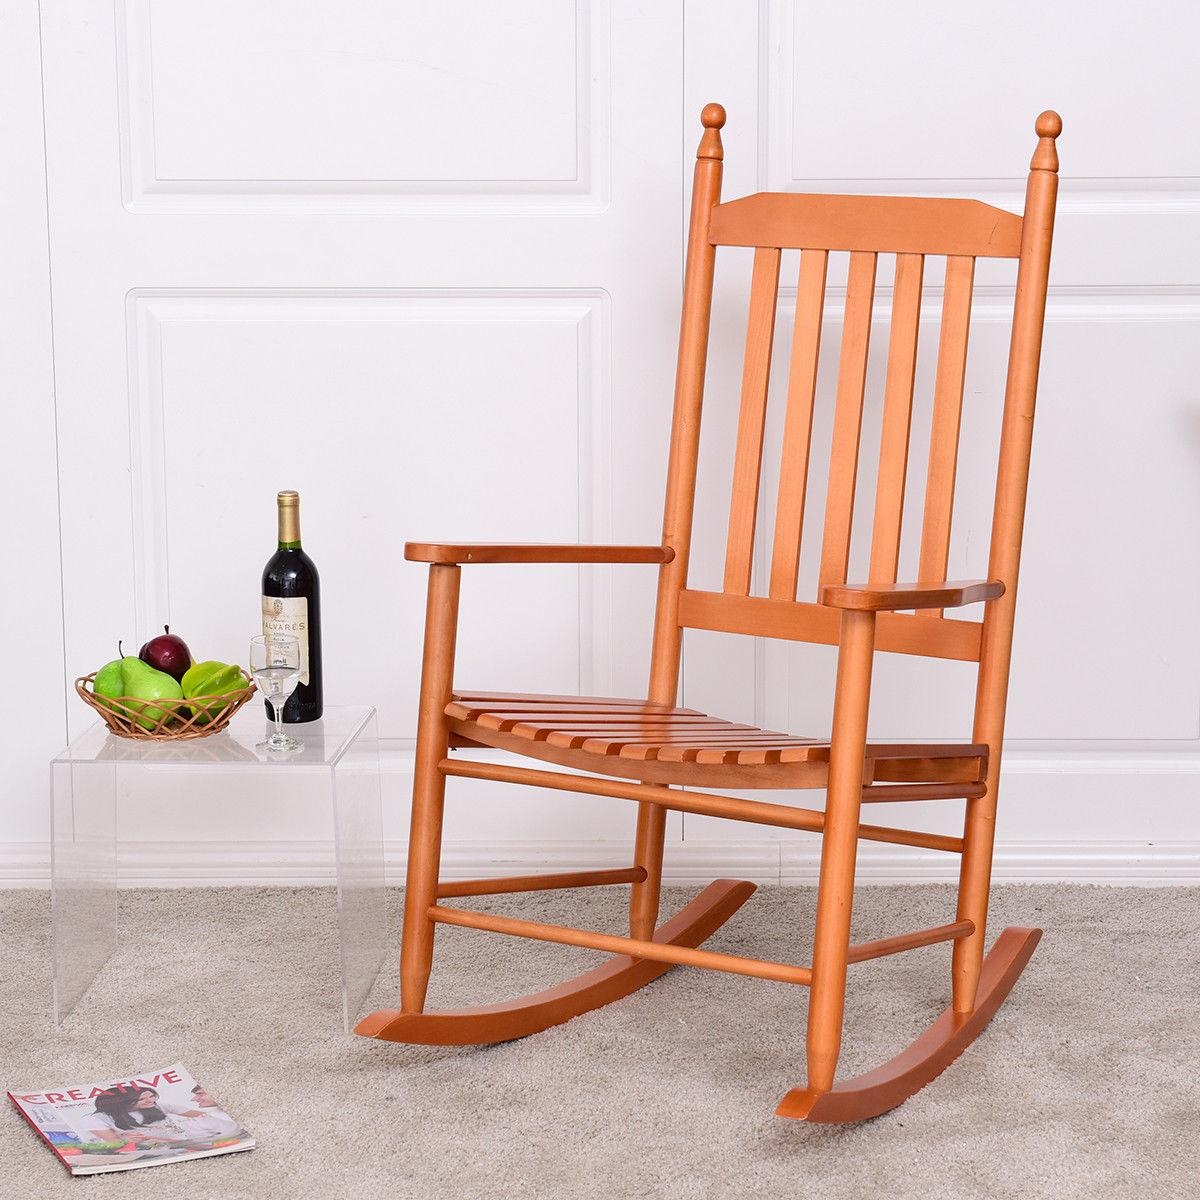 Giantex Wooden Rocking Chair Porch Rocker Armchair Balcony Deck Garden Furniture Modern Walnut Garden Chair HW56354WA